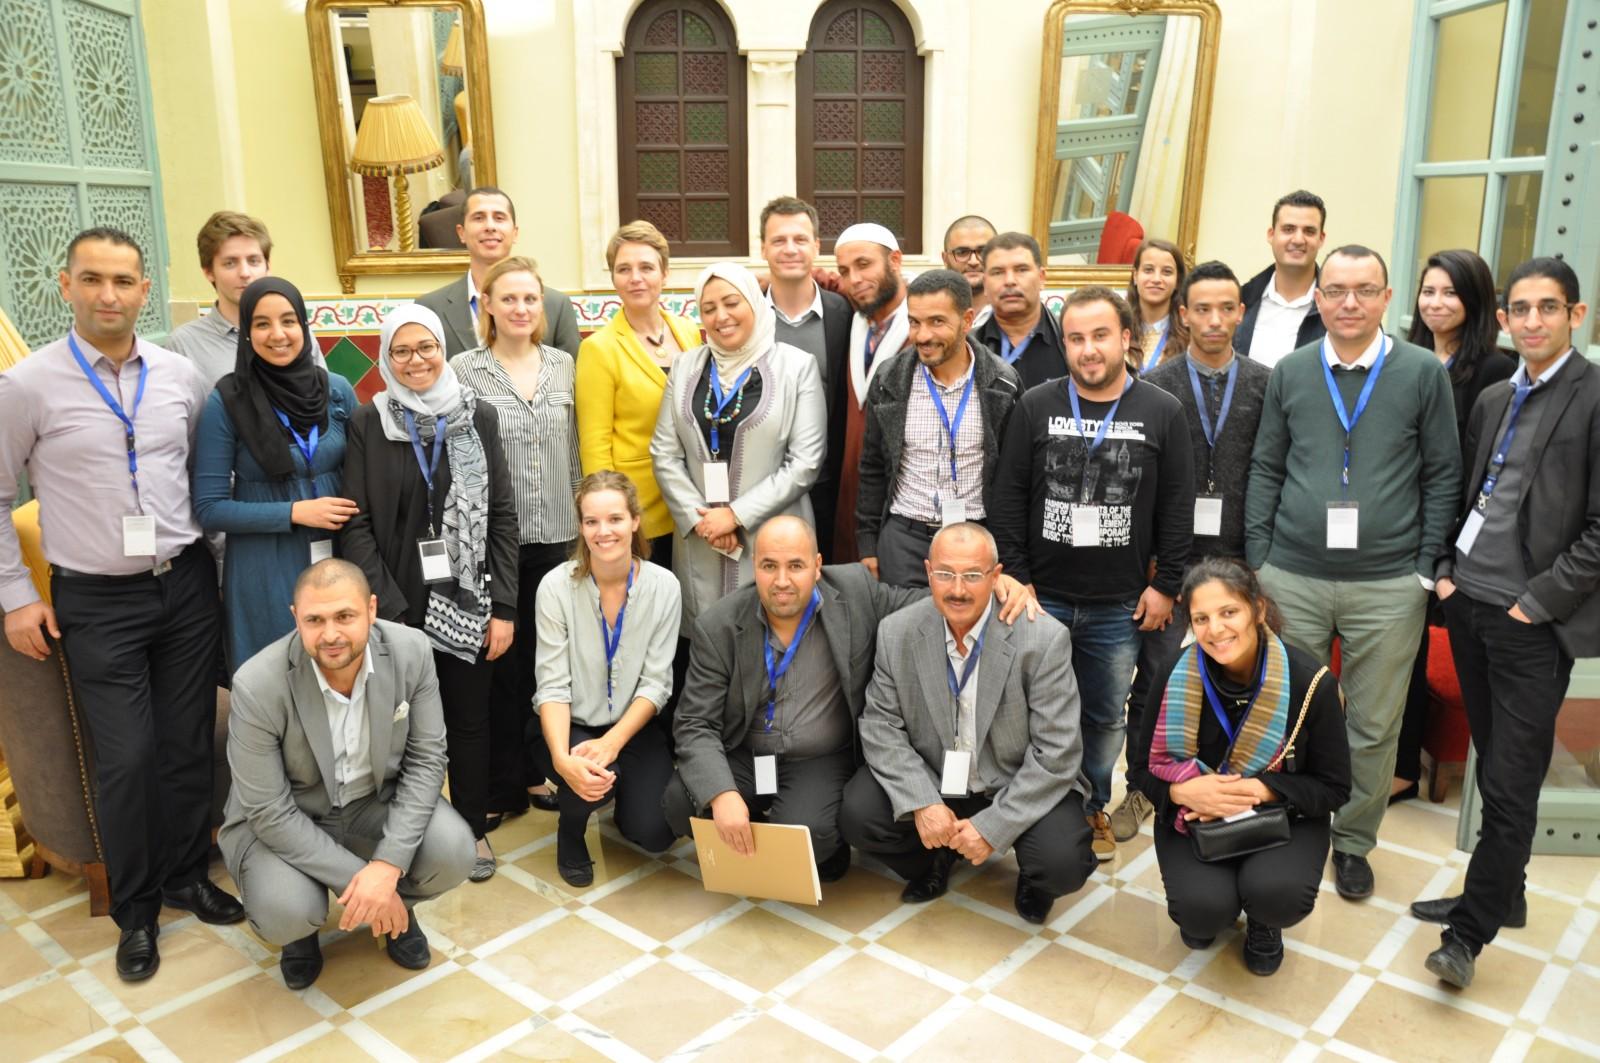 fmcg_tunis_group